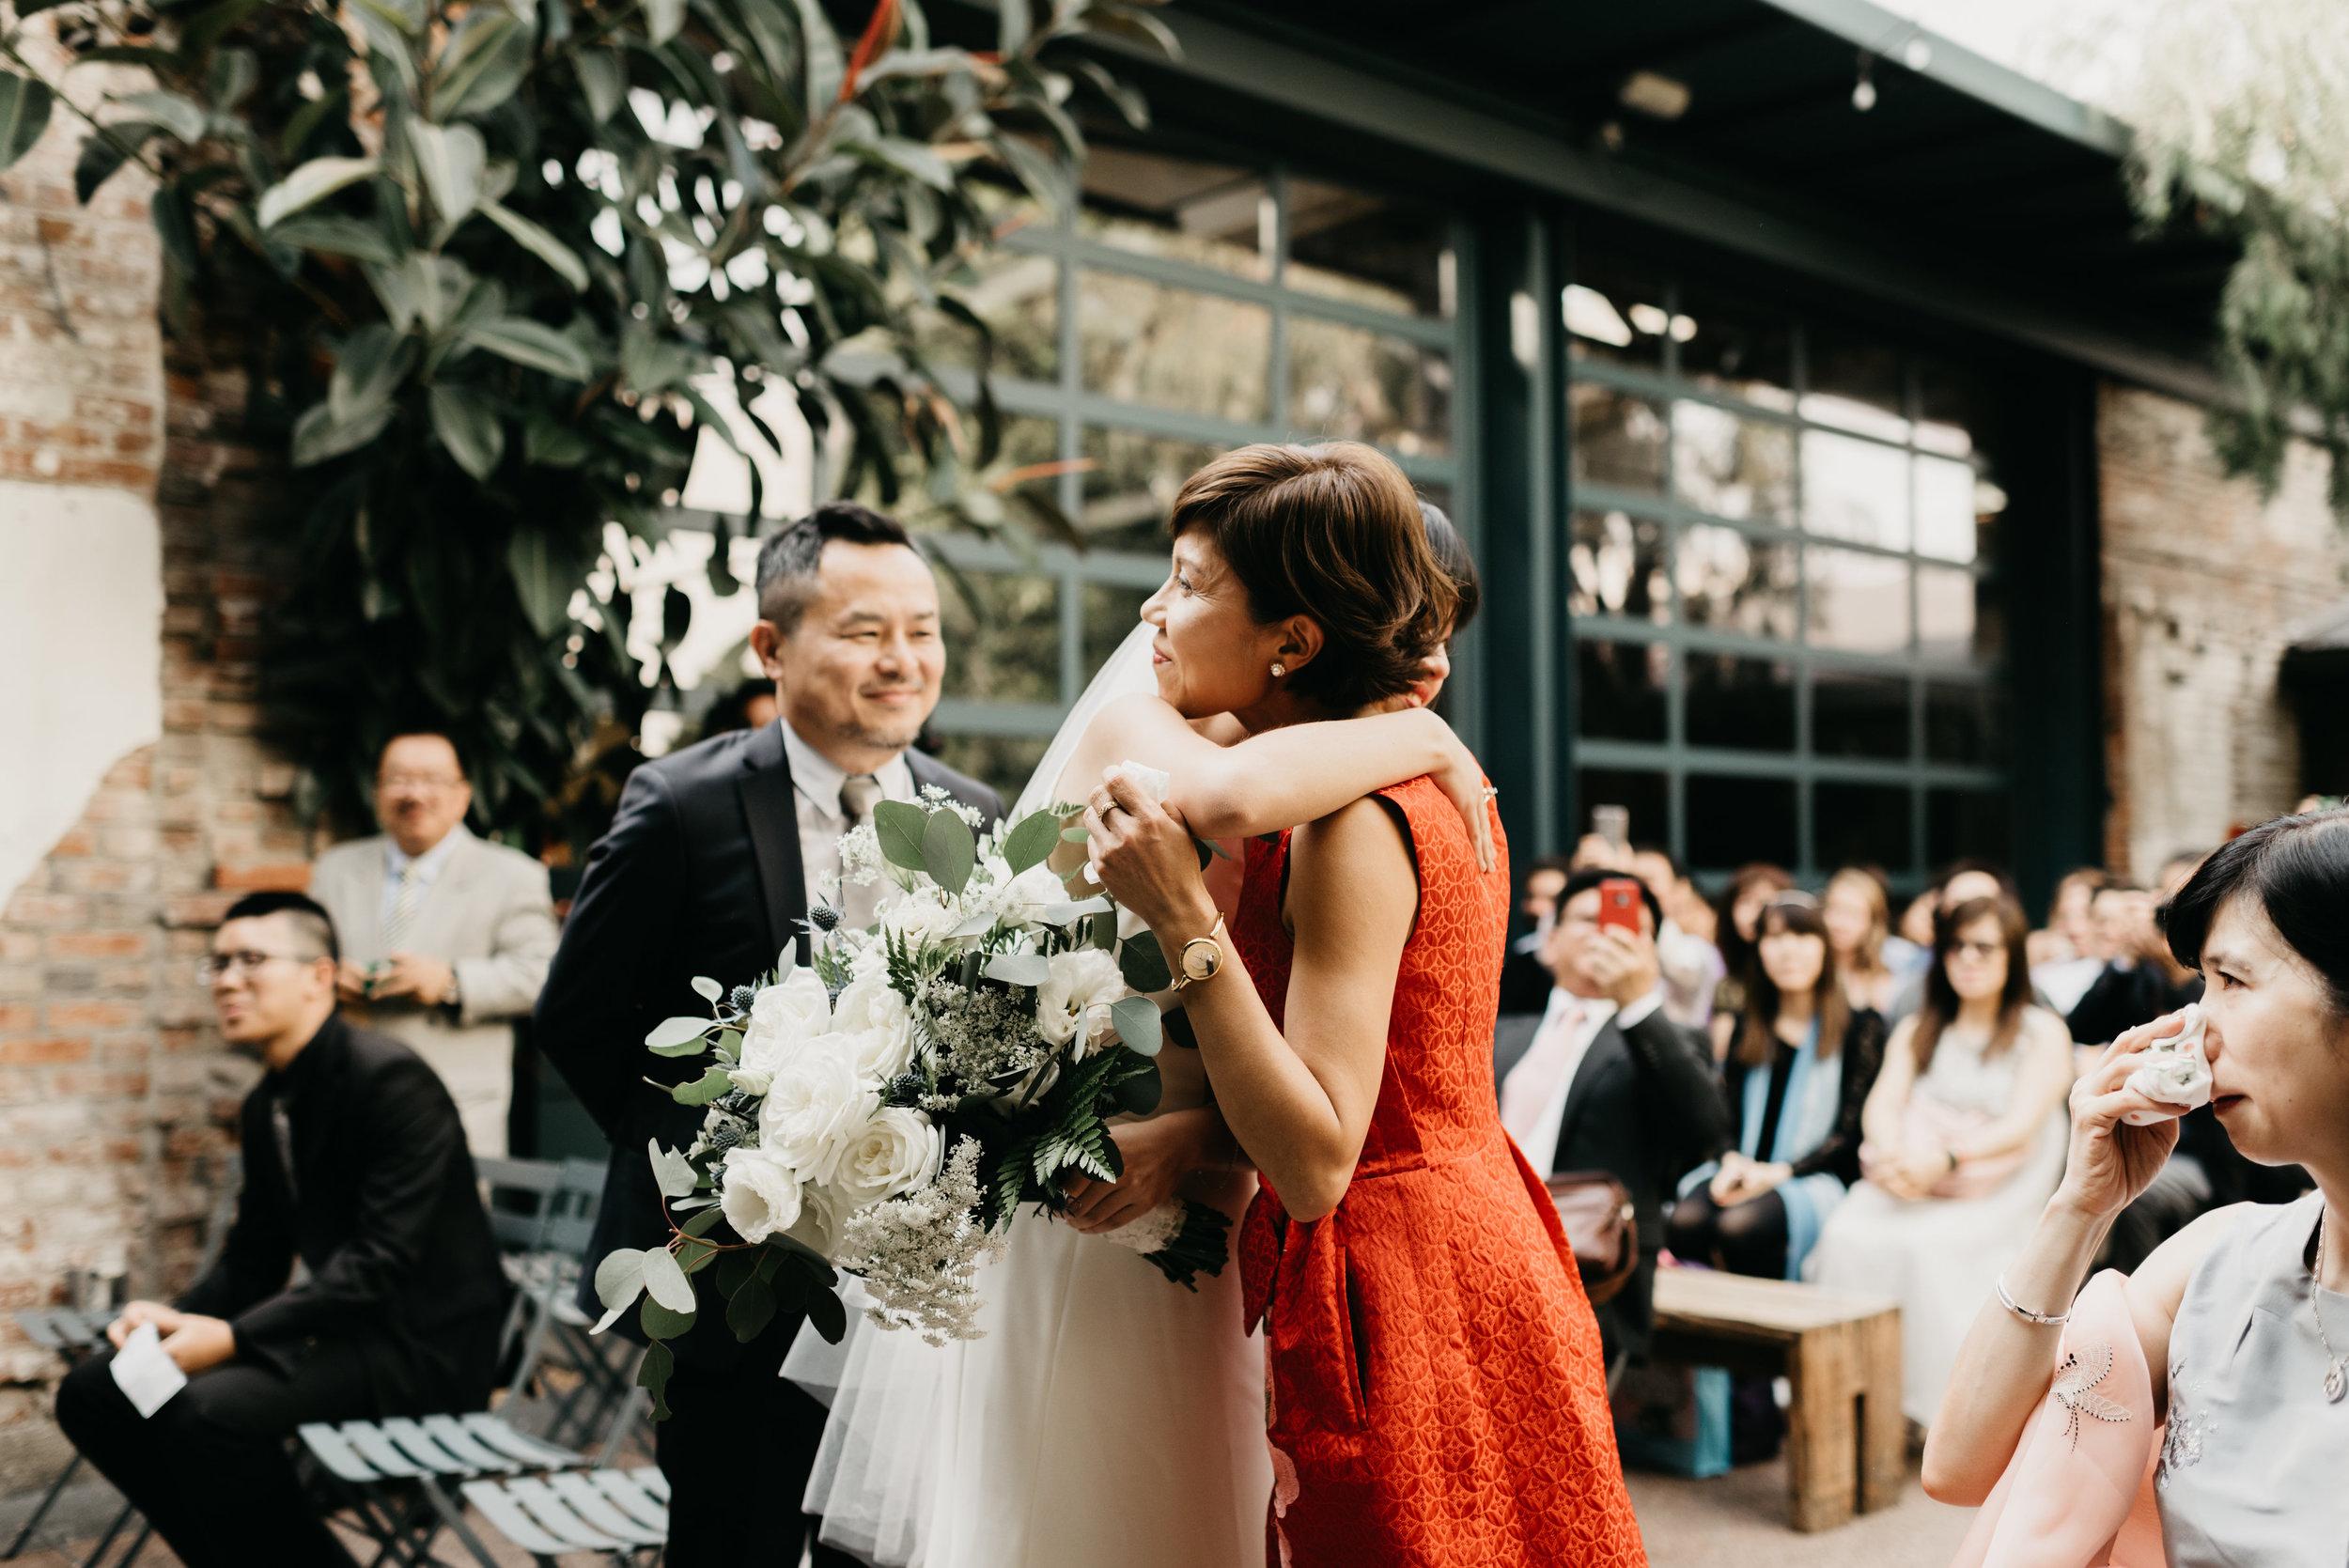 Millwick-wedding-planner61.jpg